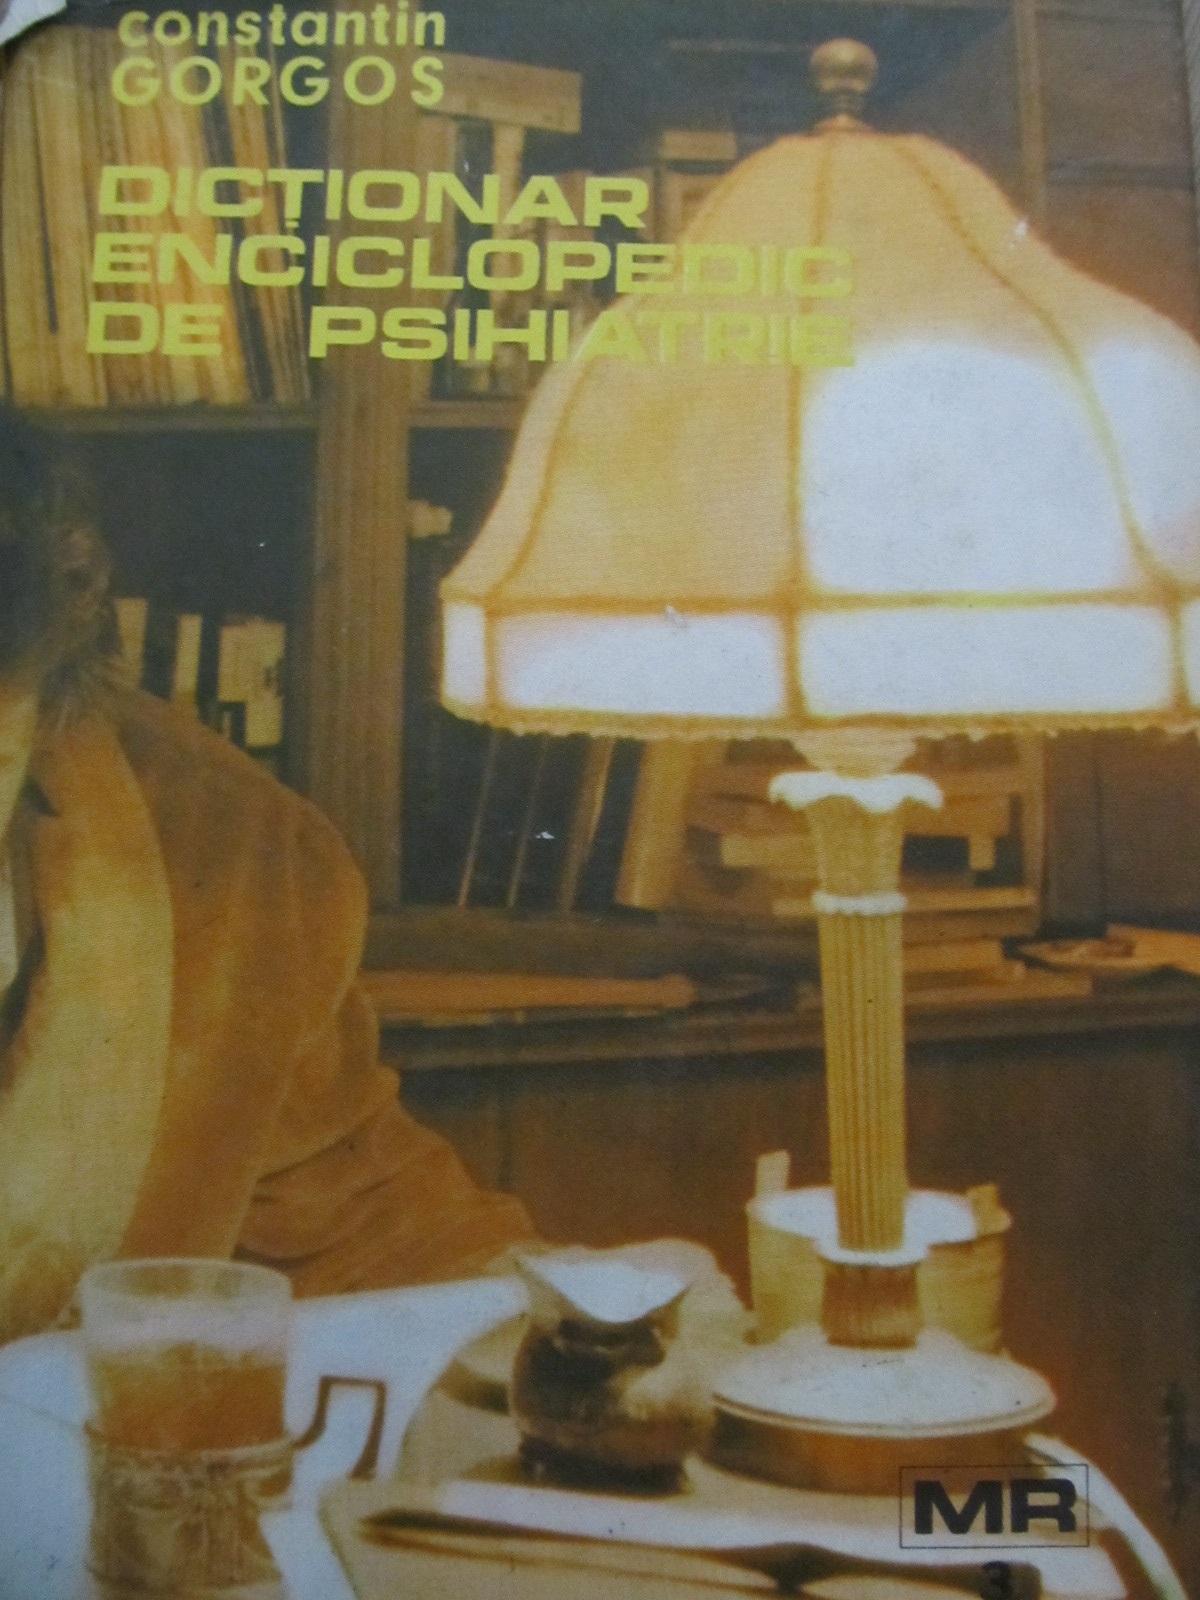 Dictionar enciclopedic de psihiatrie M - R (vol. 3) [1] - Constantin Gorgos | Detalii carte